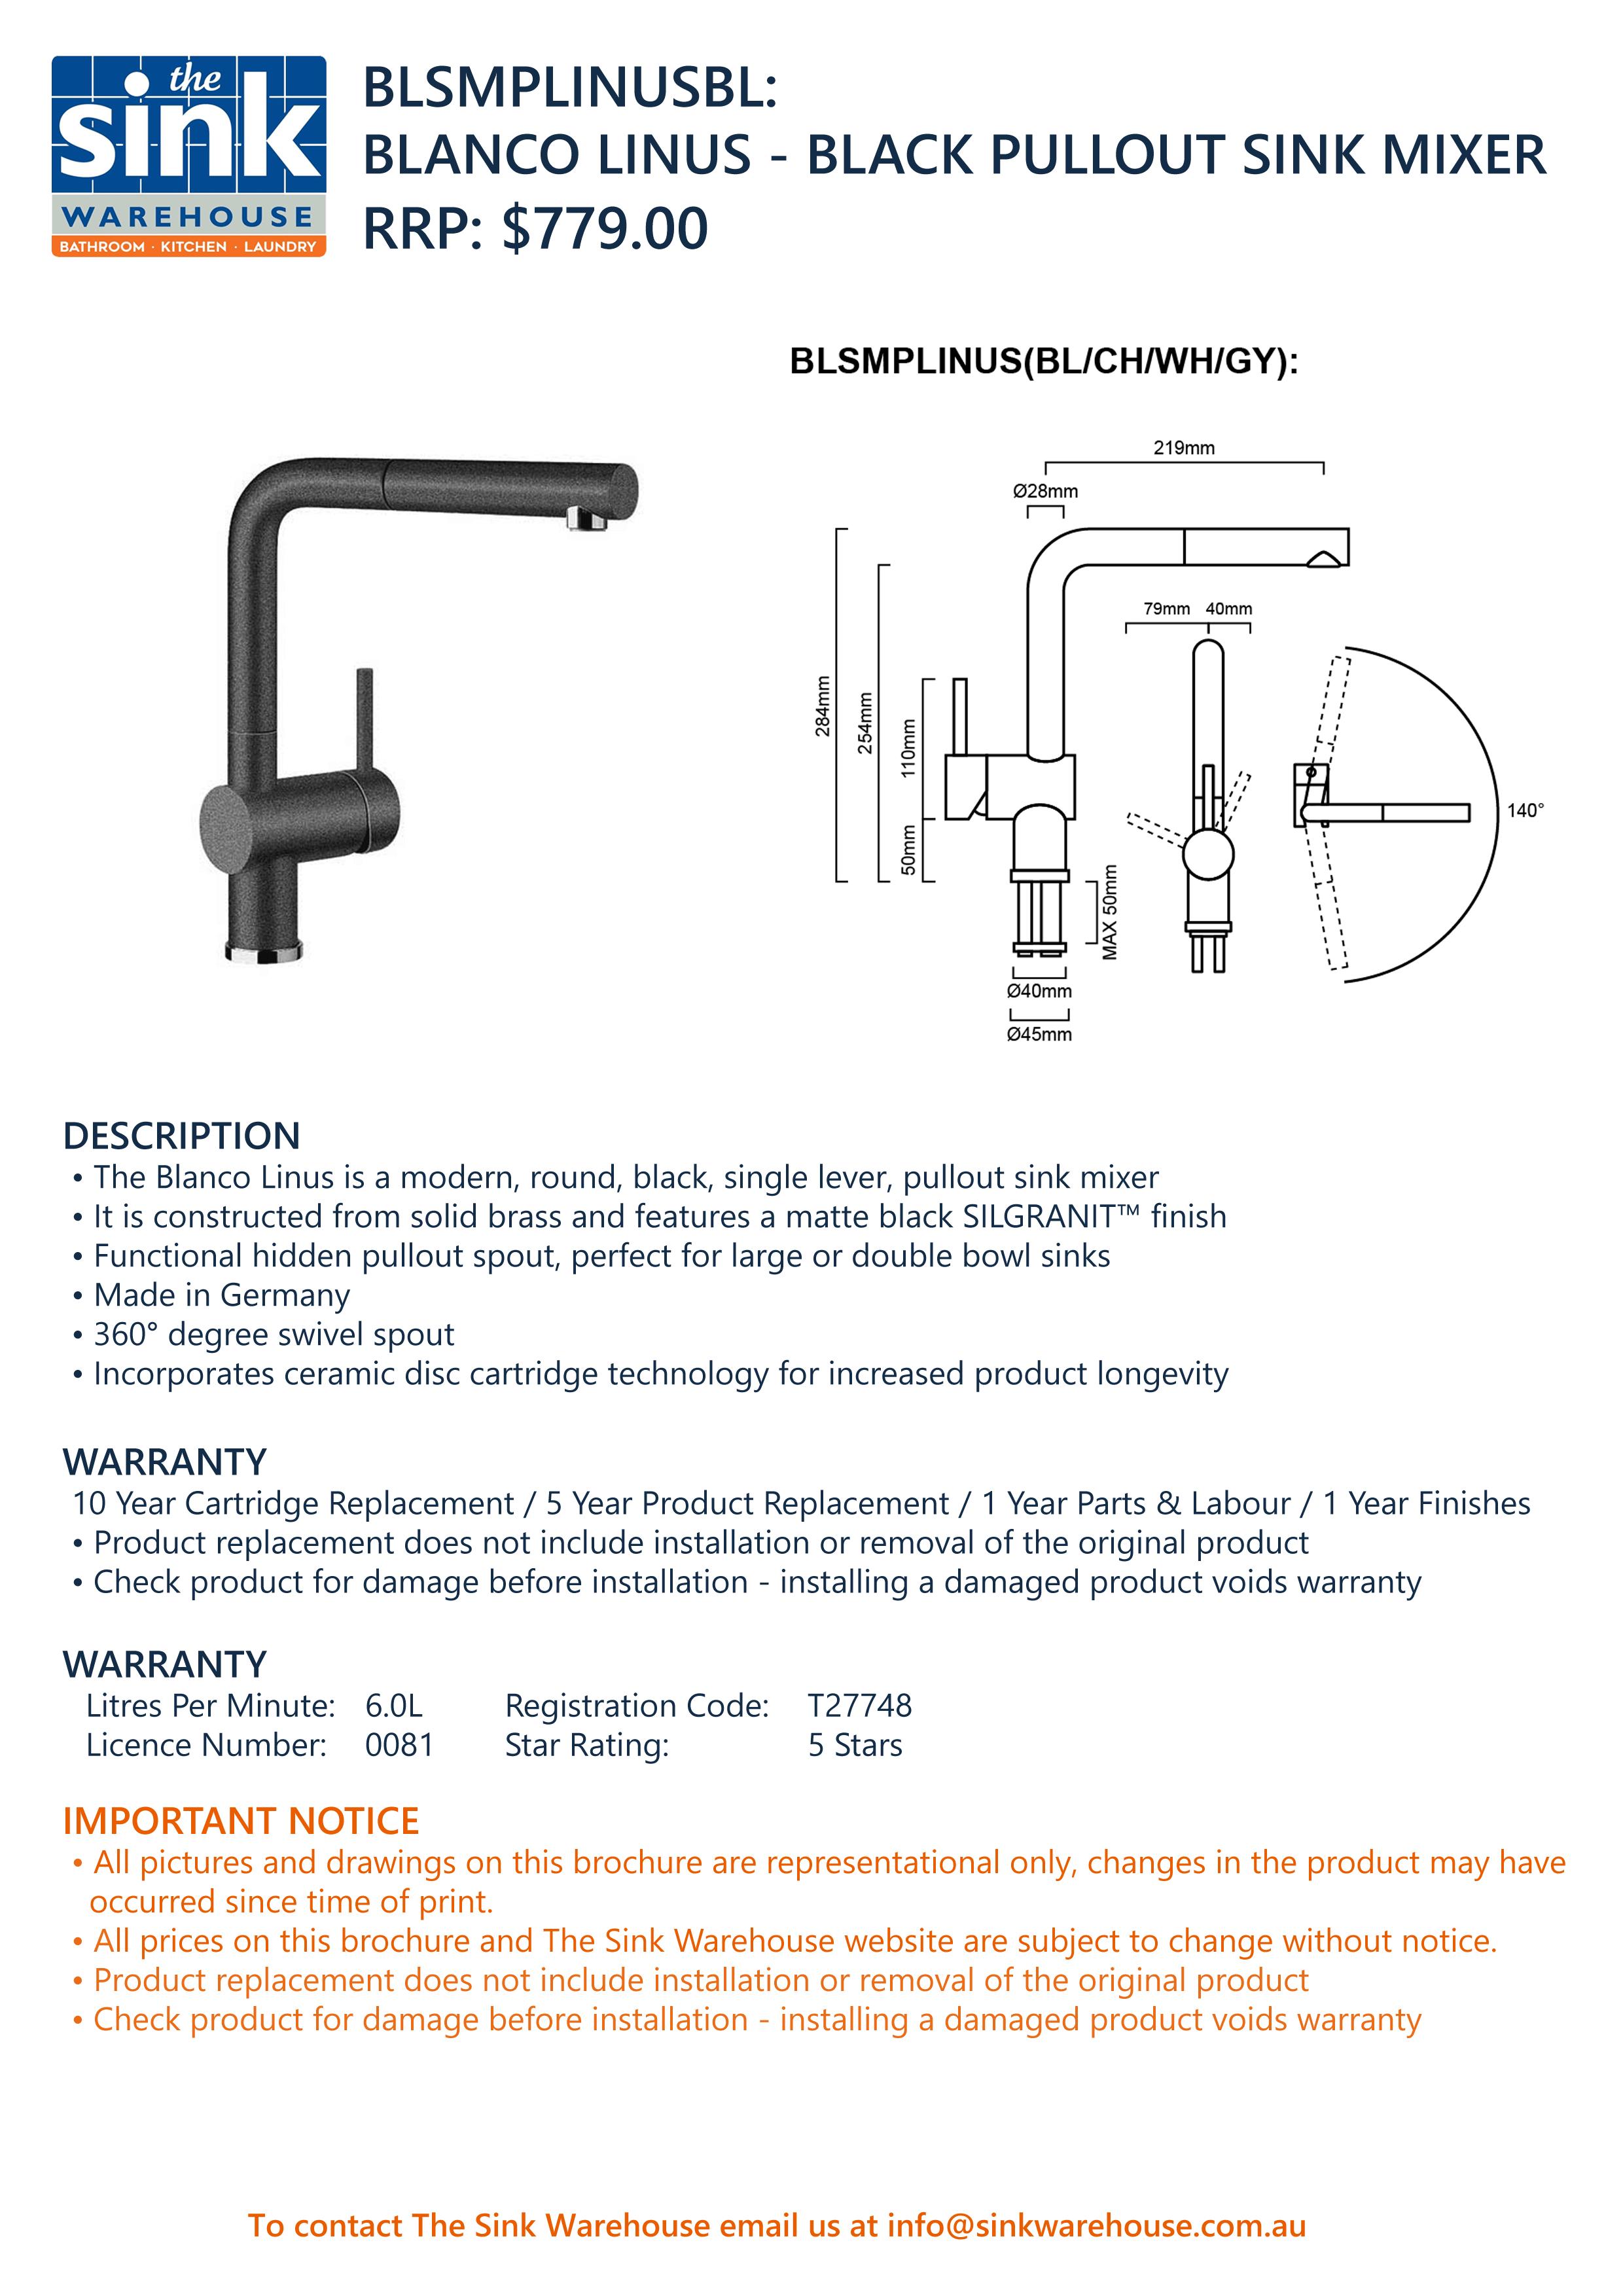 blsmplinusbl-product-spec-sheet.png